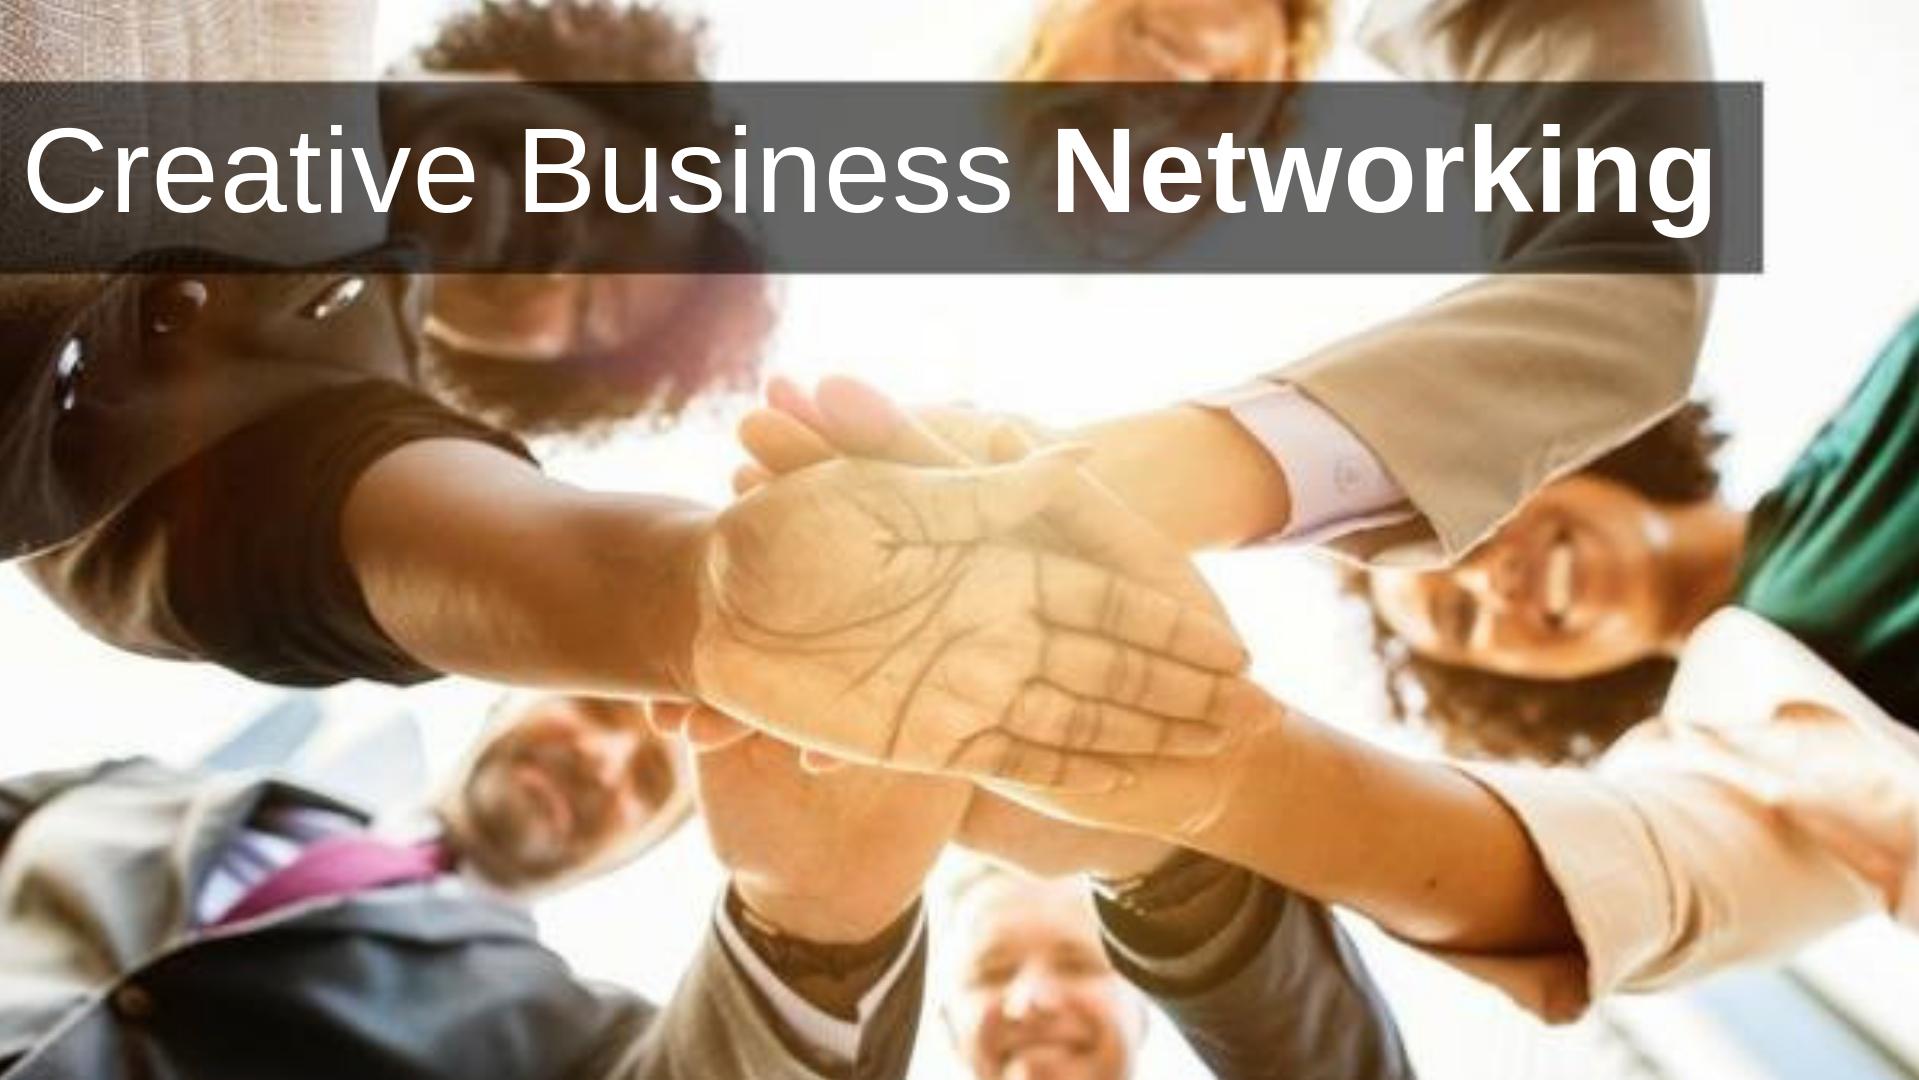 Atlanta Creative Business Networking